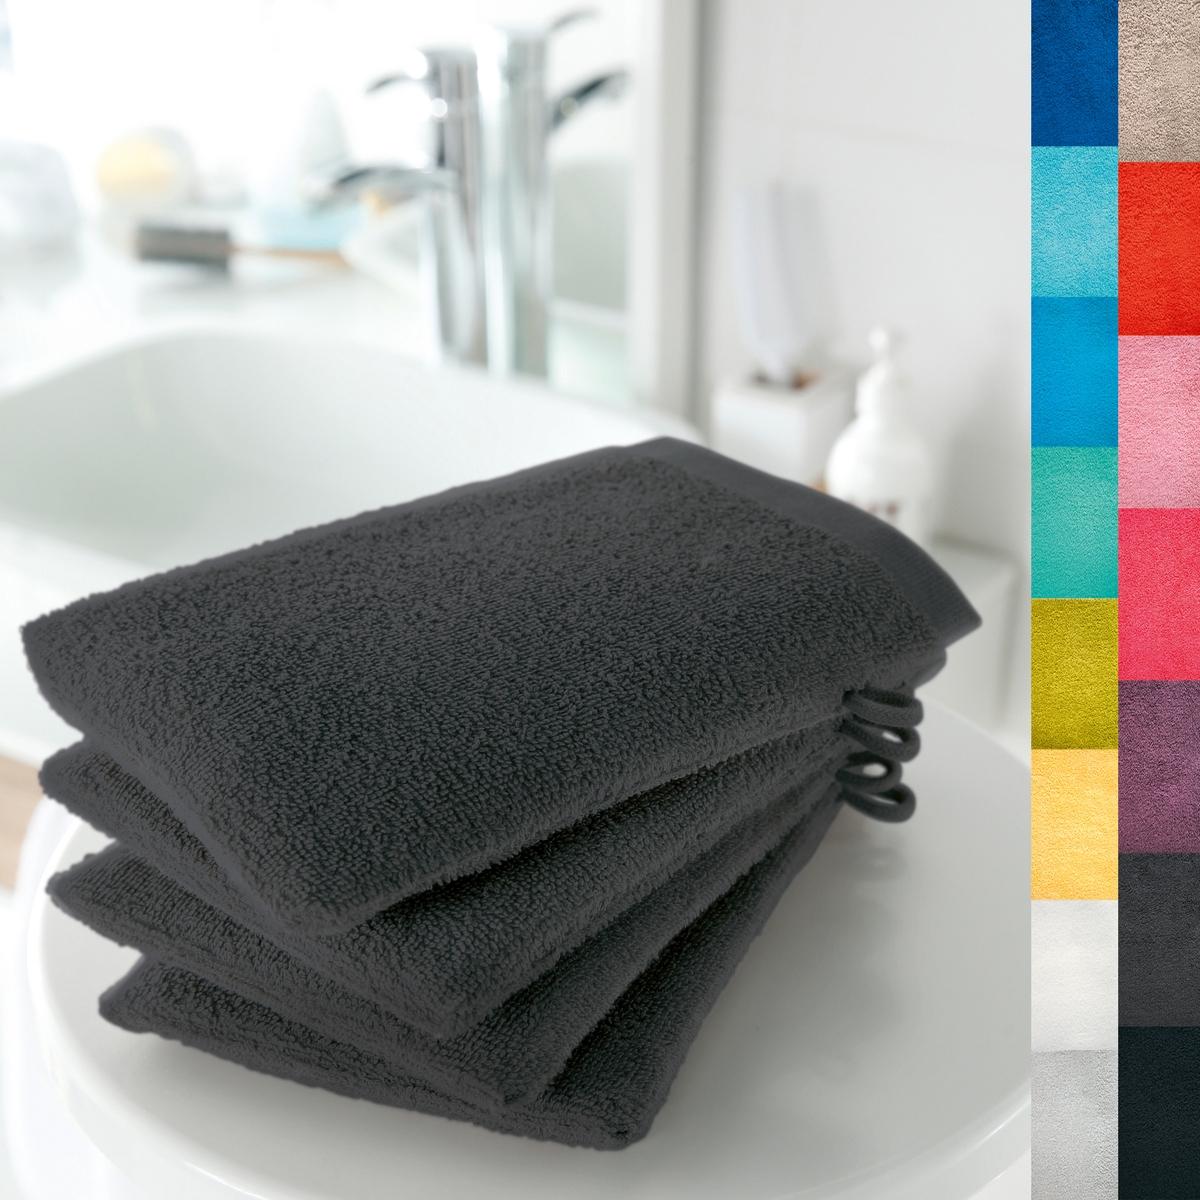 4 банные рукавички, 420 г/м² от La Redoute